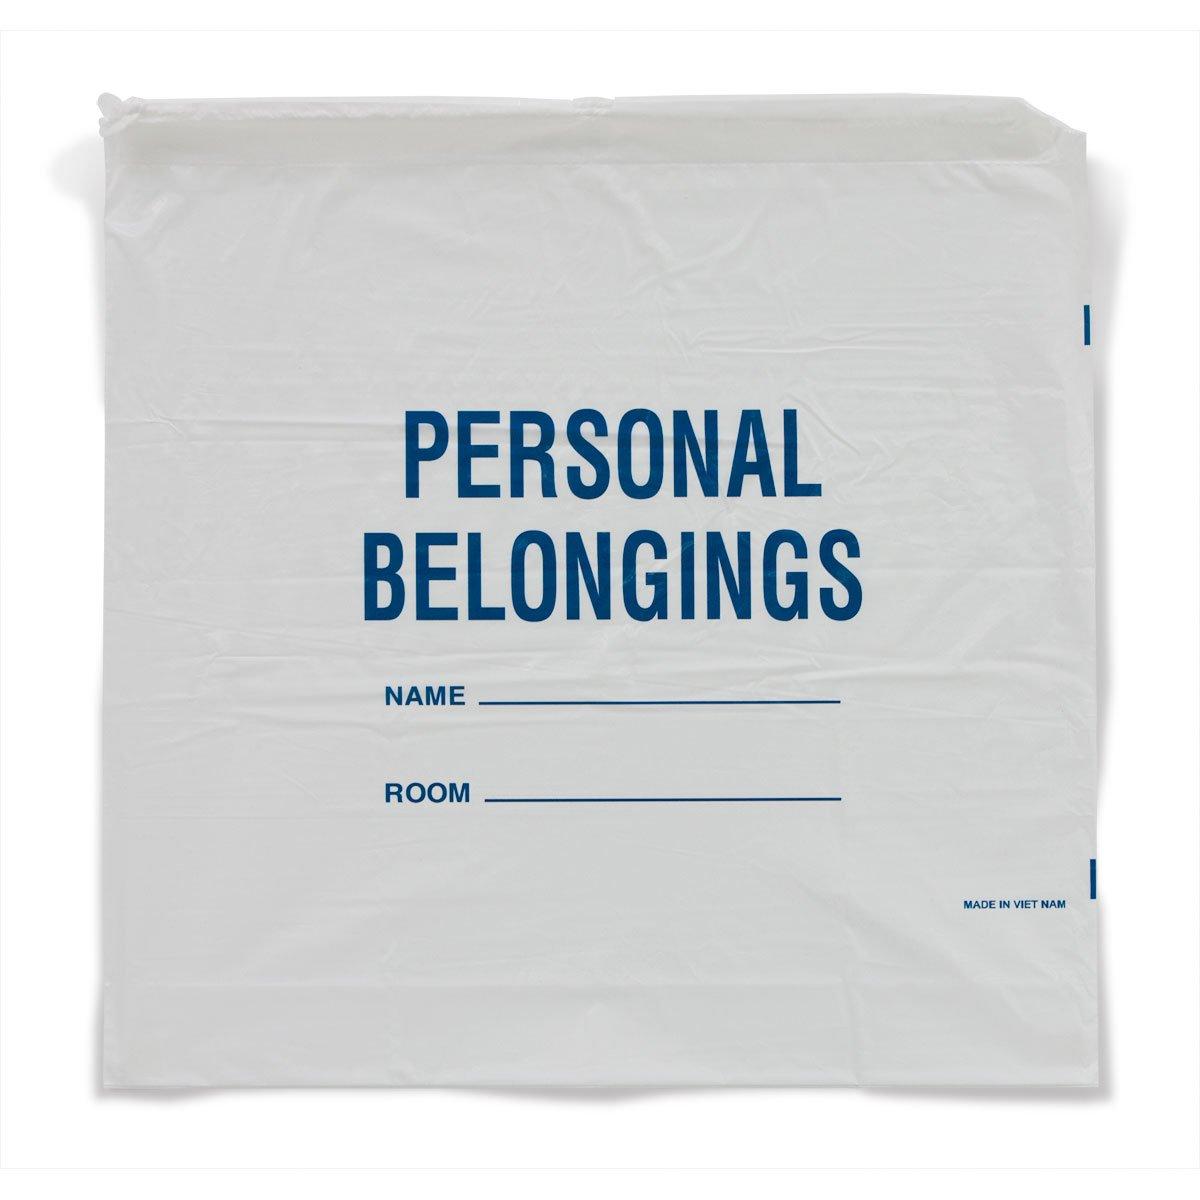 Patient Personal Belongings Bags Drawstring White